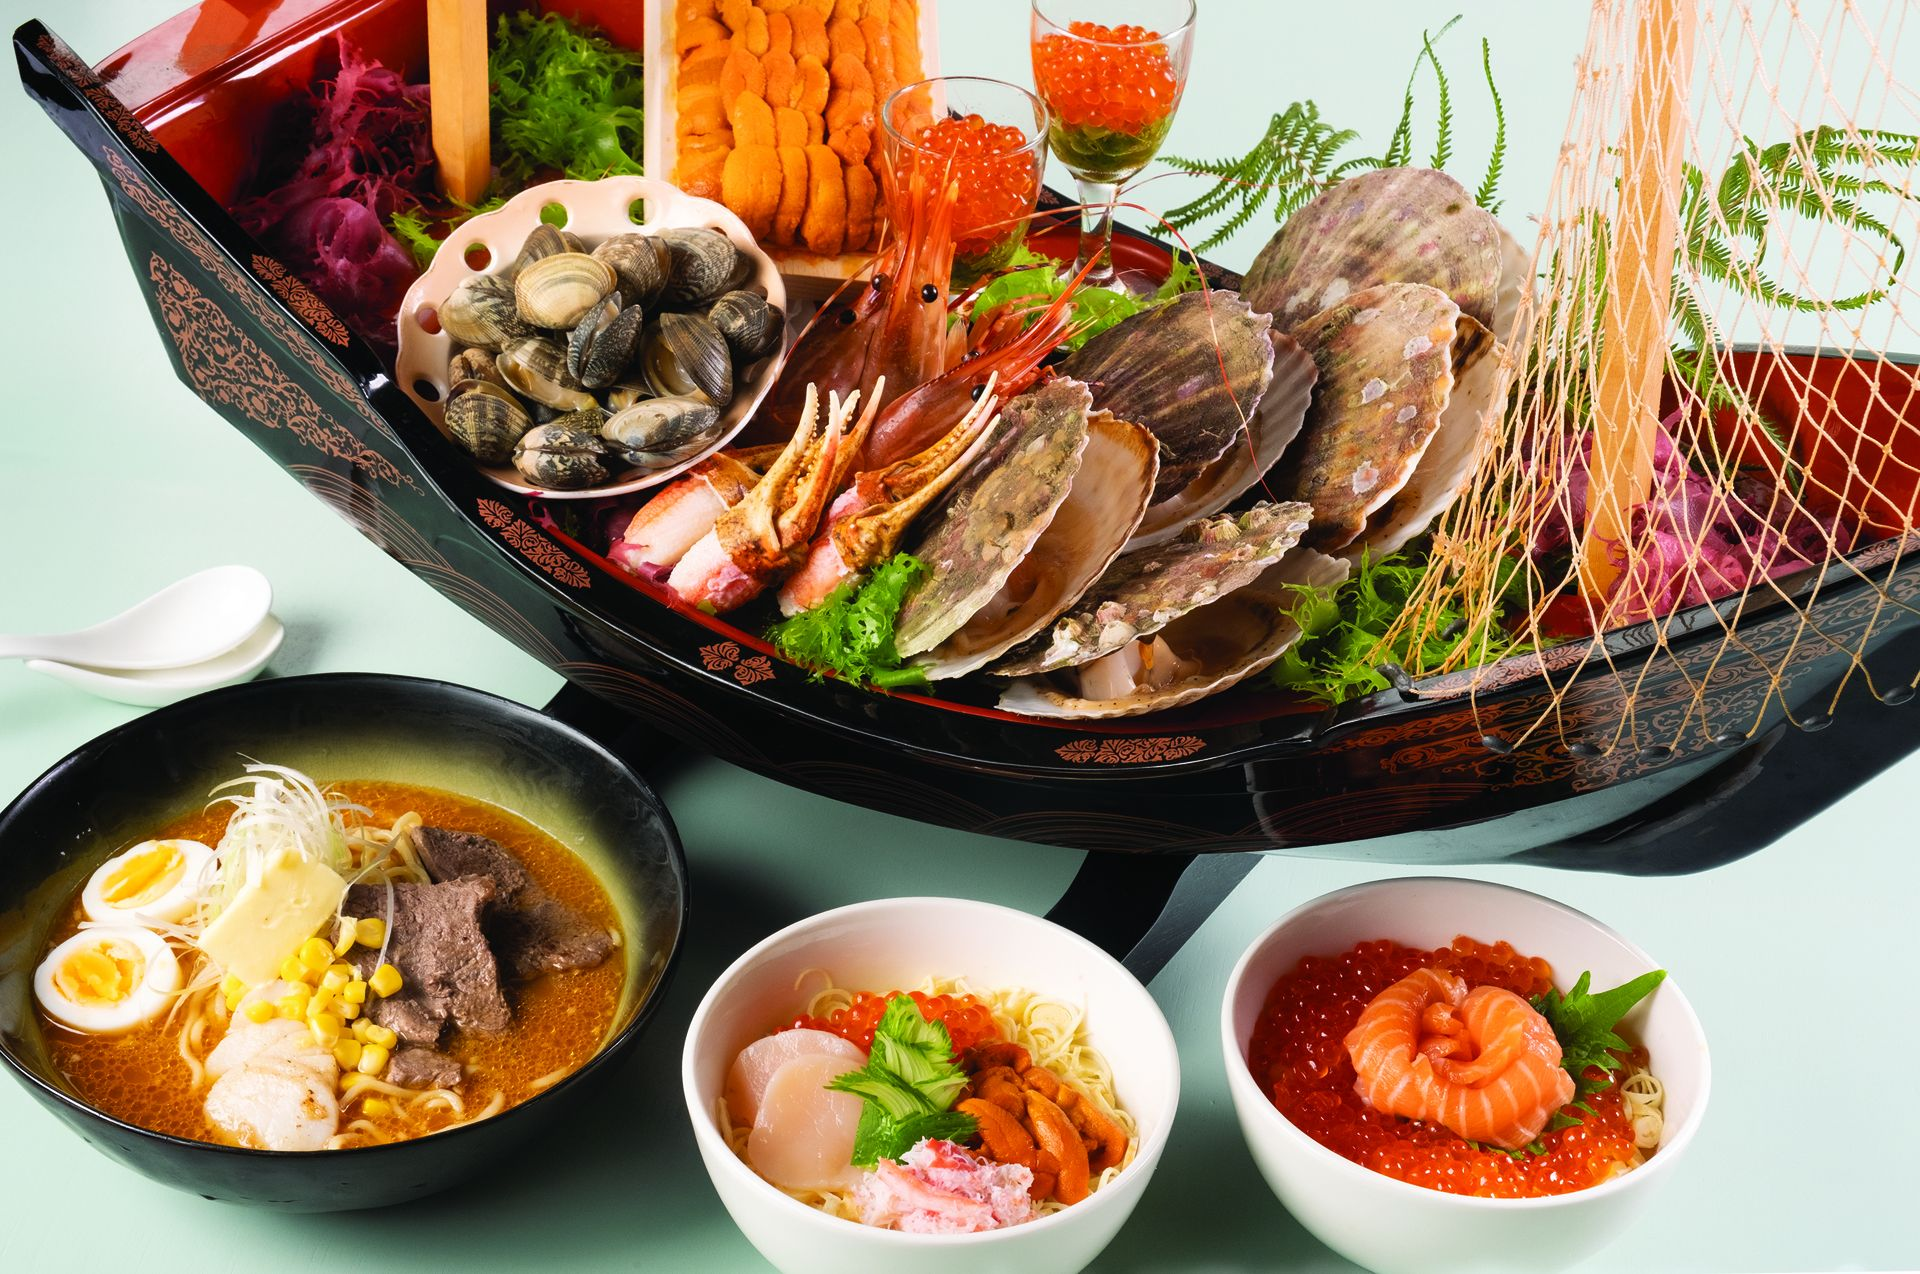 Hokkaido Cravings At Inagiku